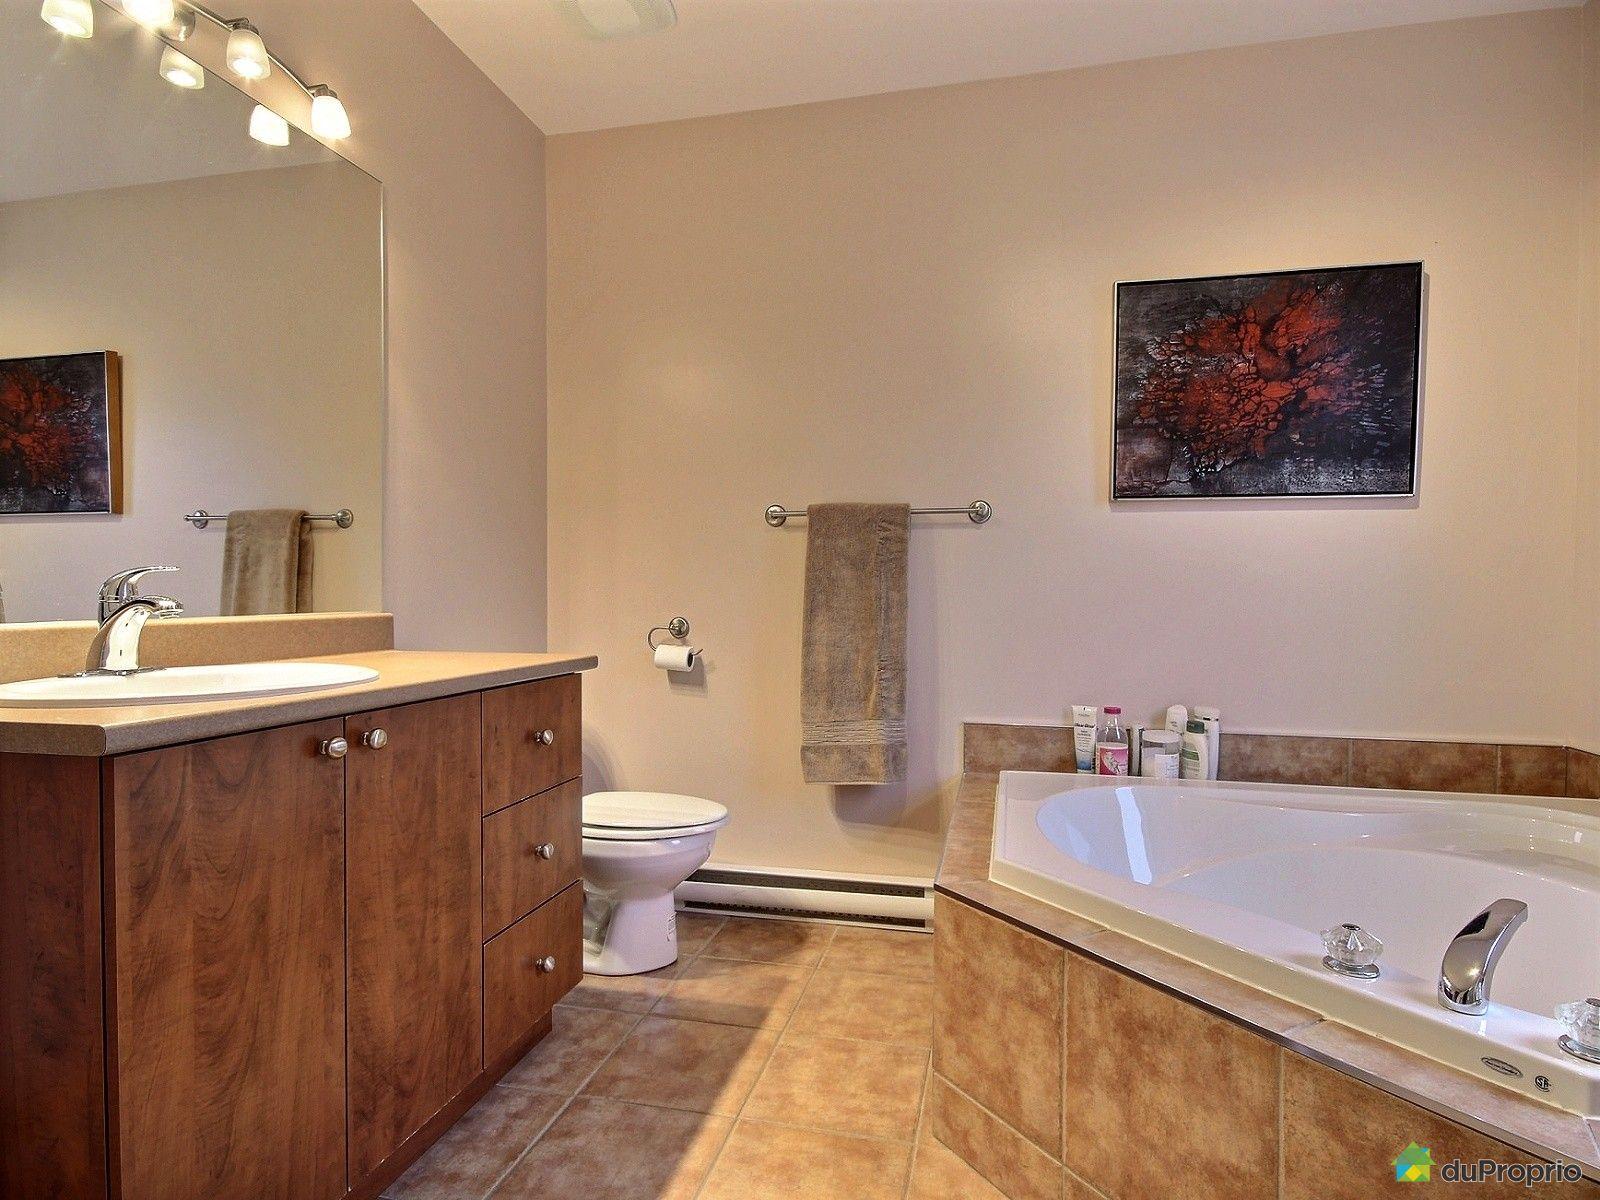 Jumel vendu vaudreuil dorion immobilier qu bec - Reno salle de bain quebec ...